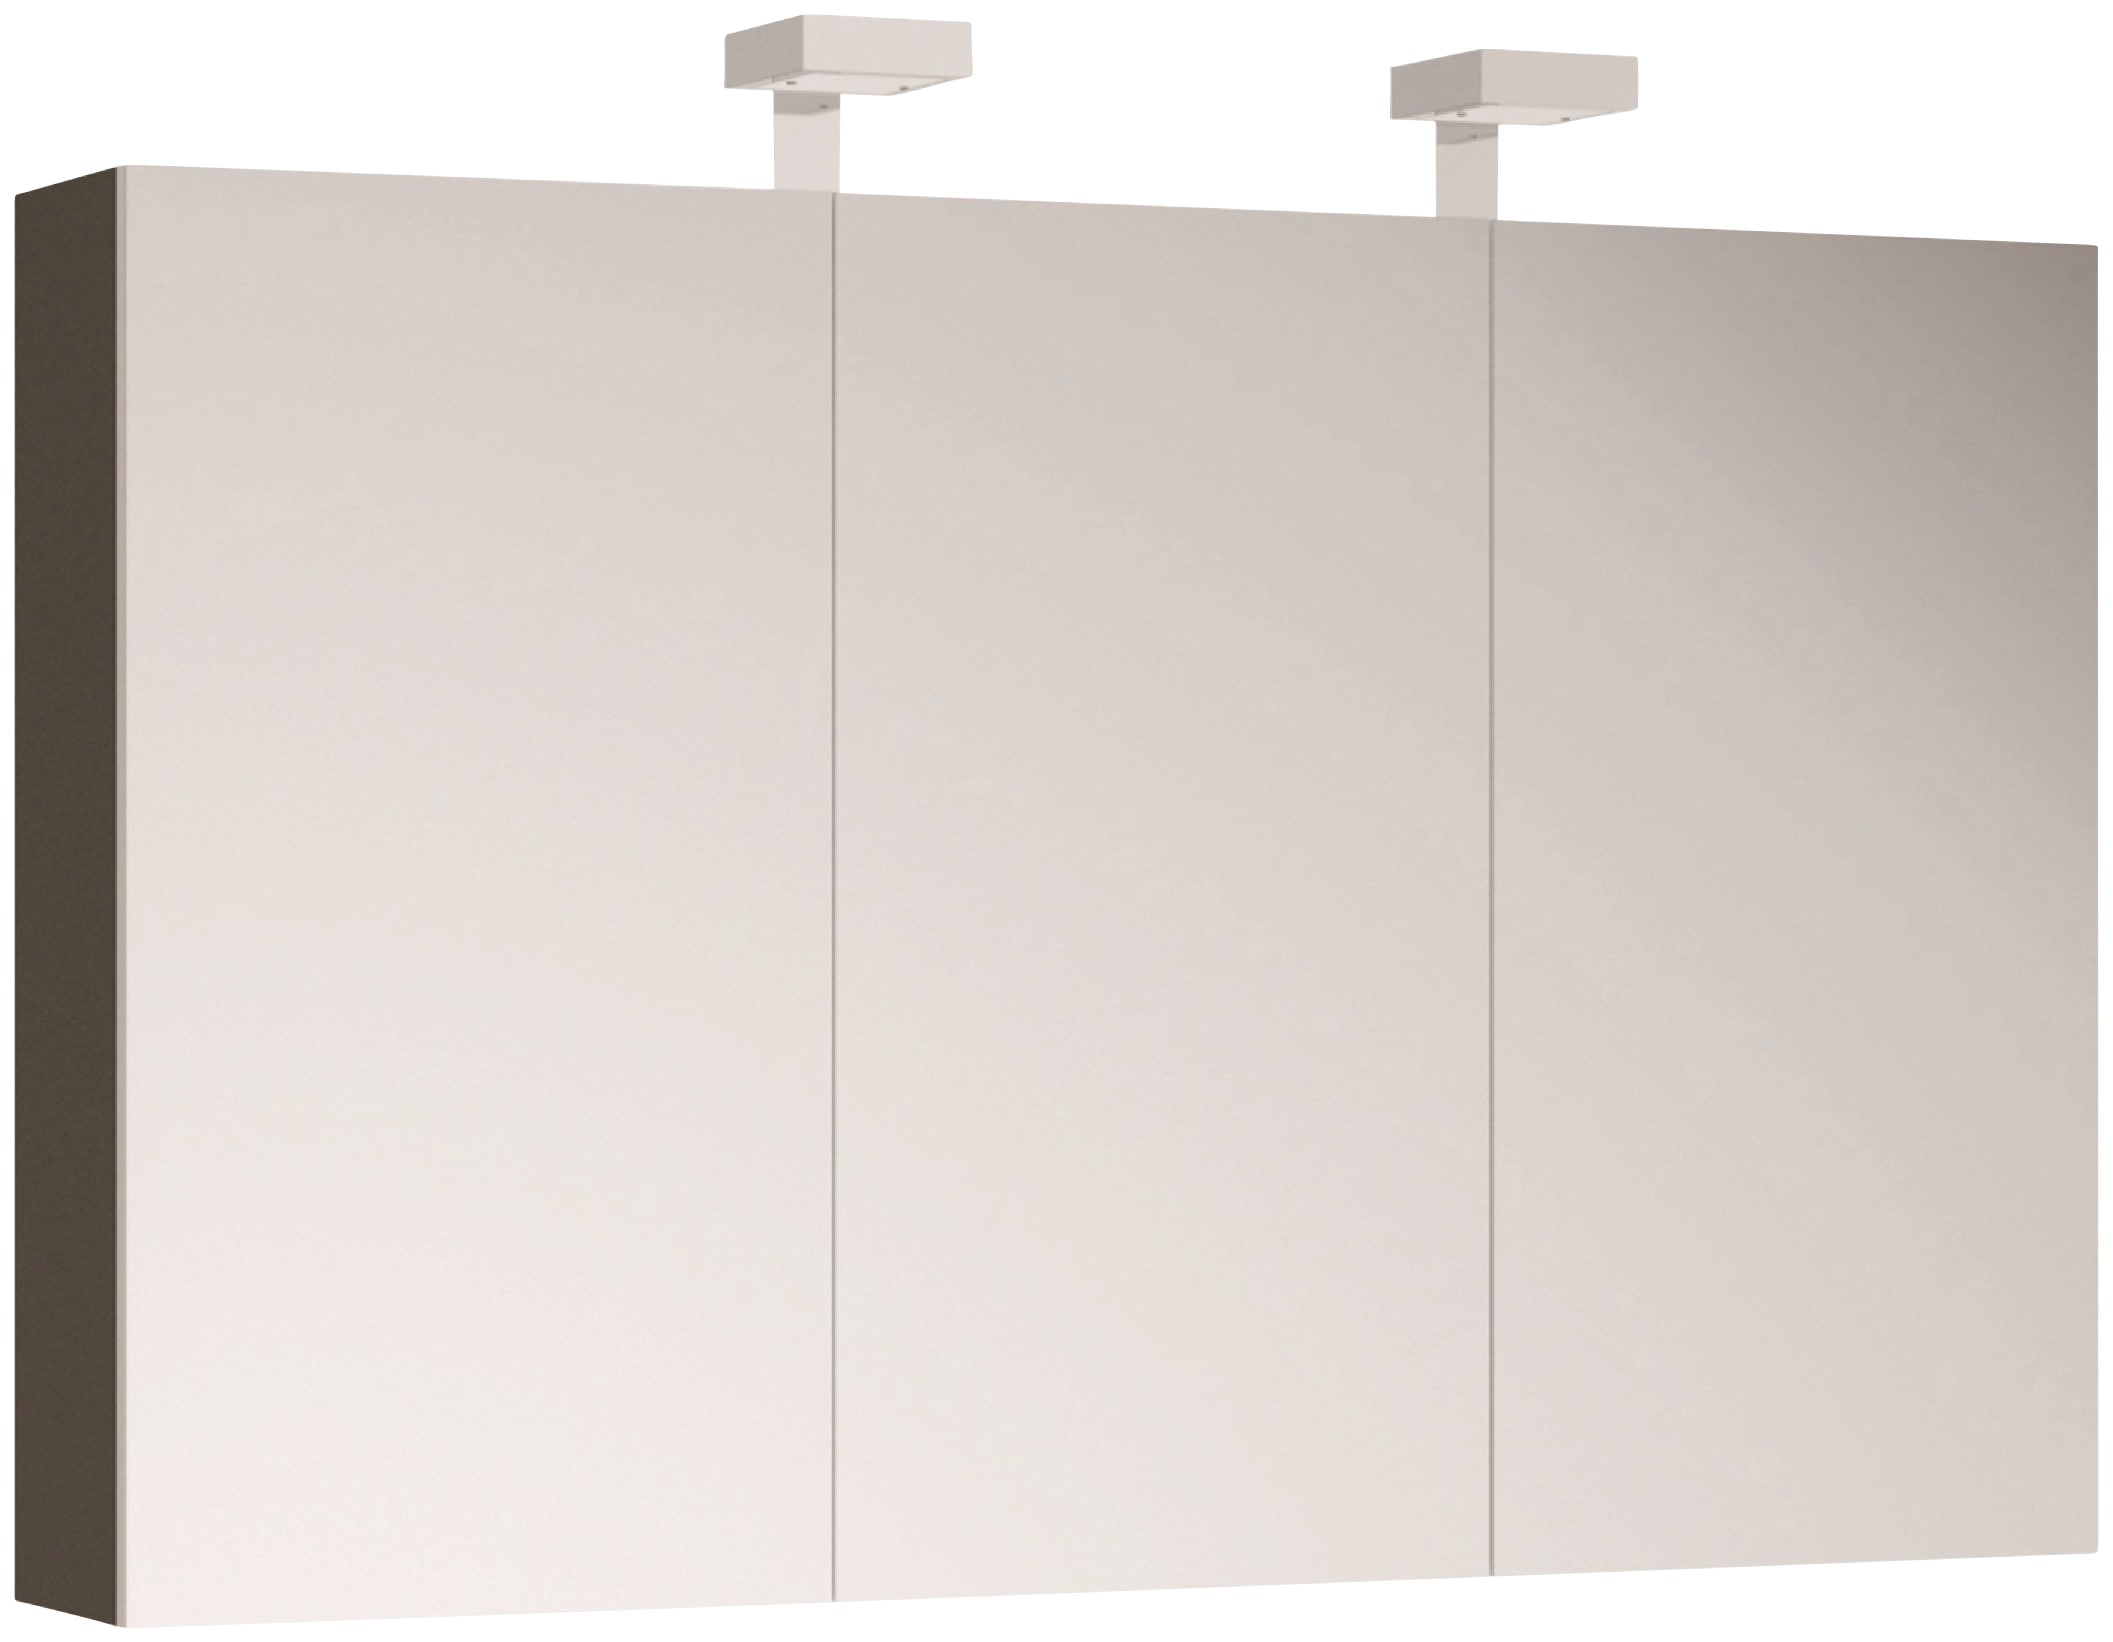 Allibert Spiegelschrank, mit LED-Beleuchtung grau Spiegelschränke Beleuchtung Badmöbel Spiegelschrank